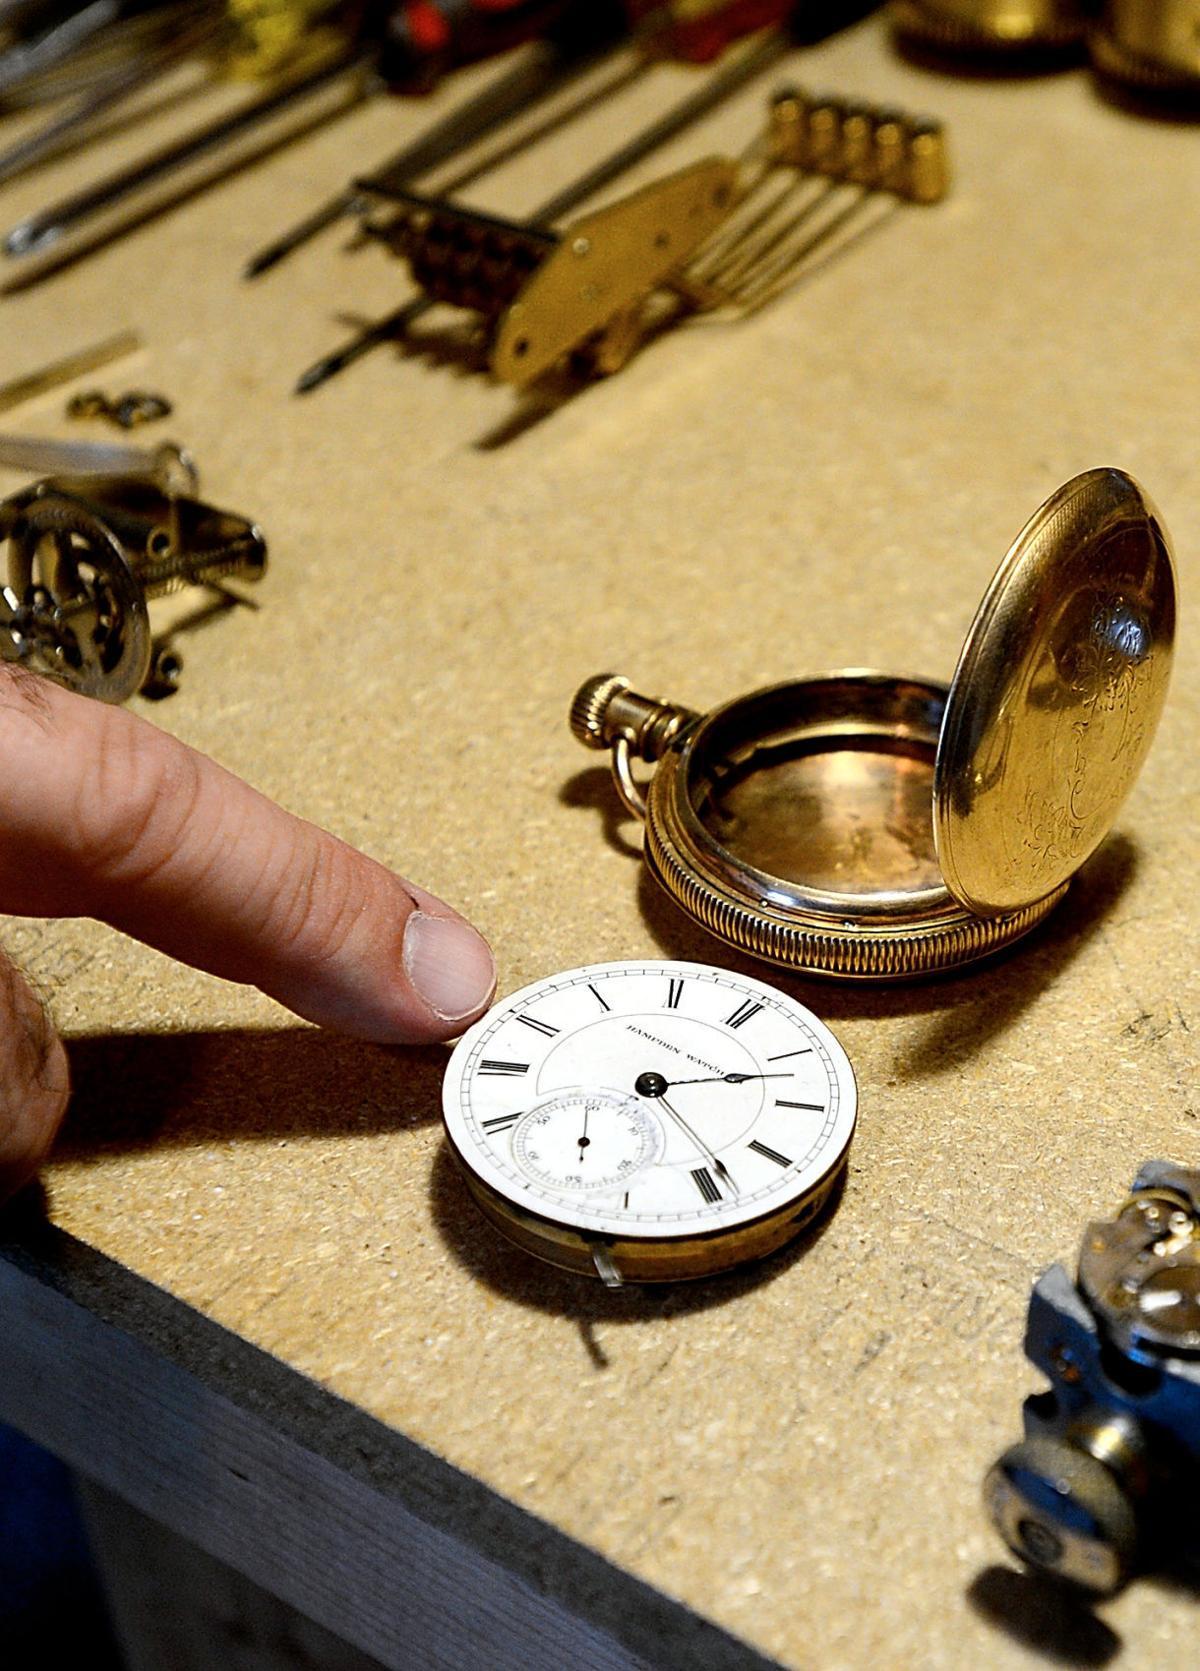 Preserving time: Clock repairman brings skills to Maryville